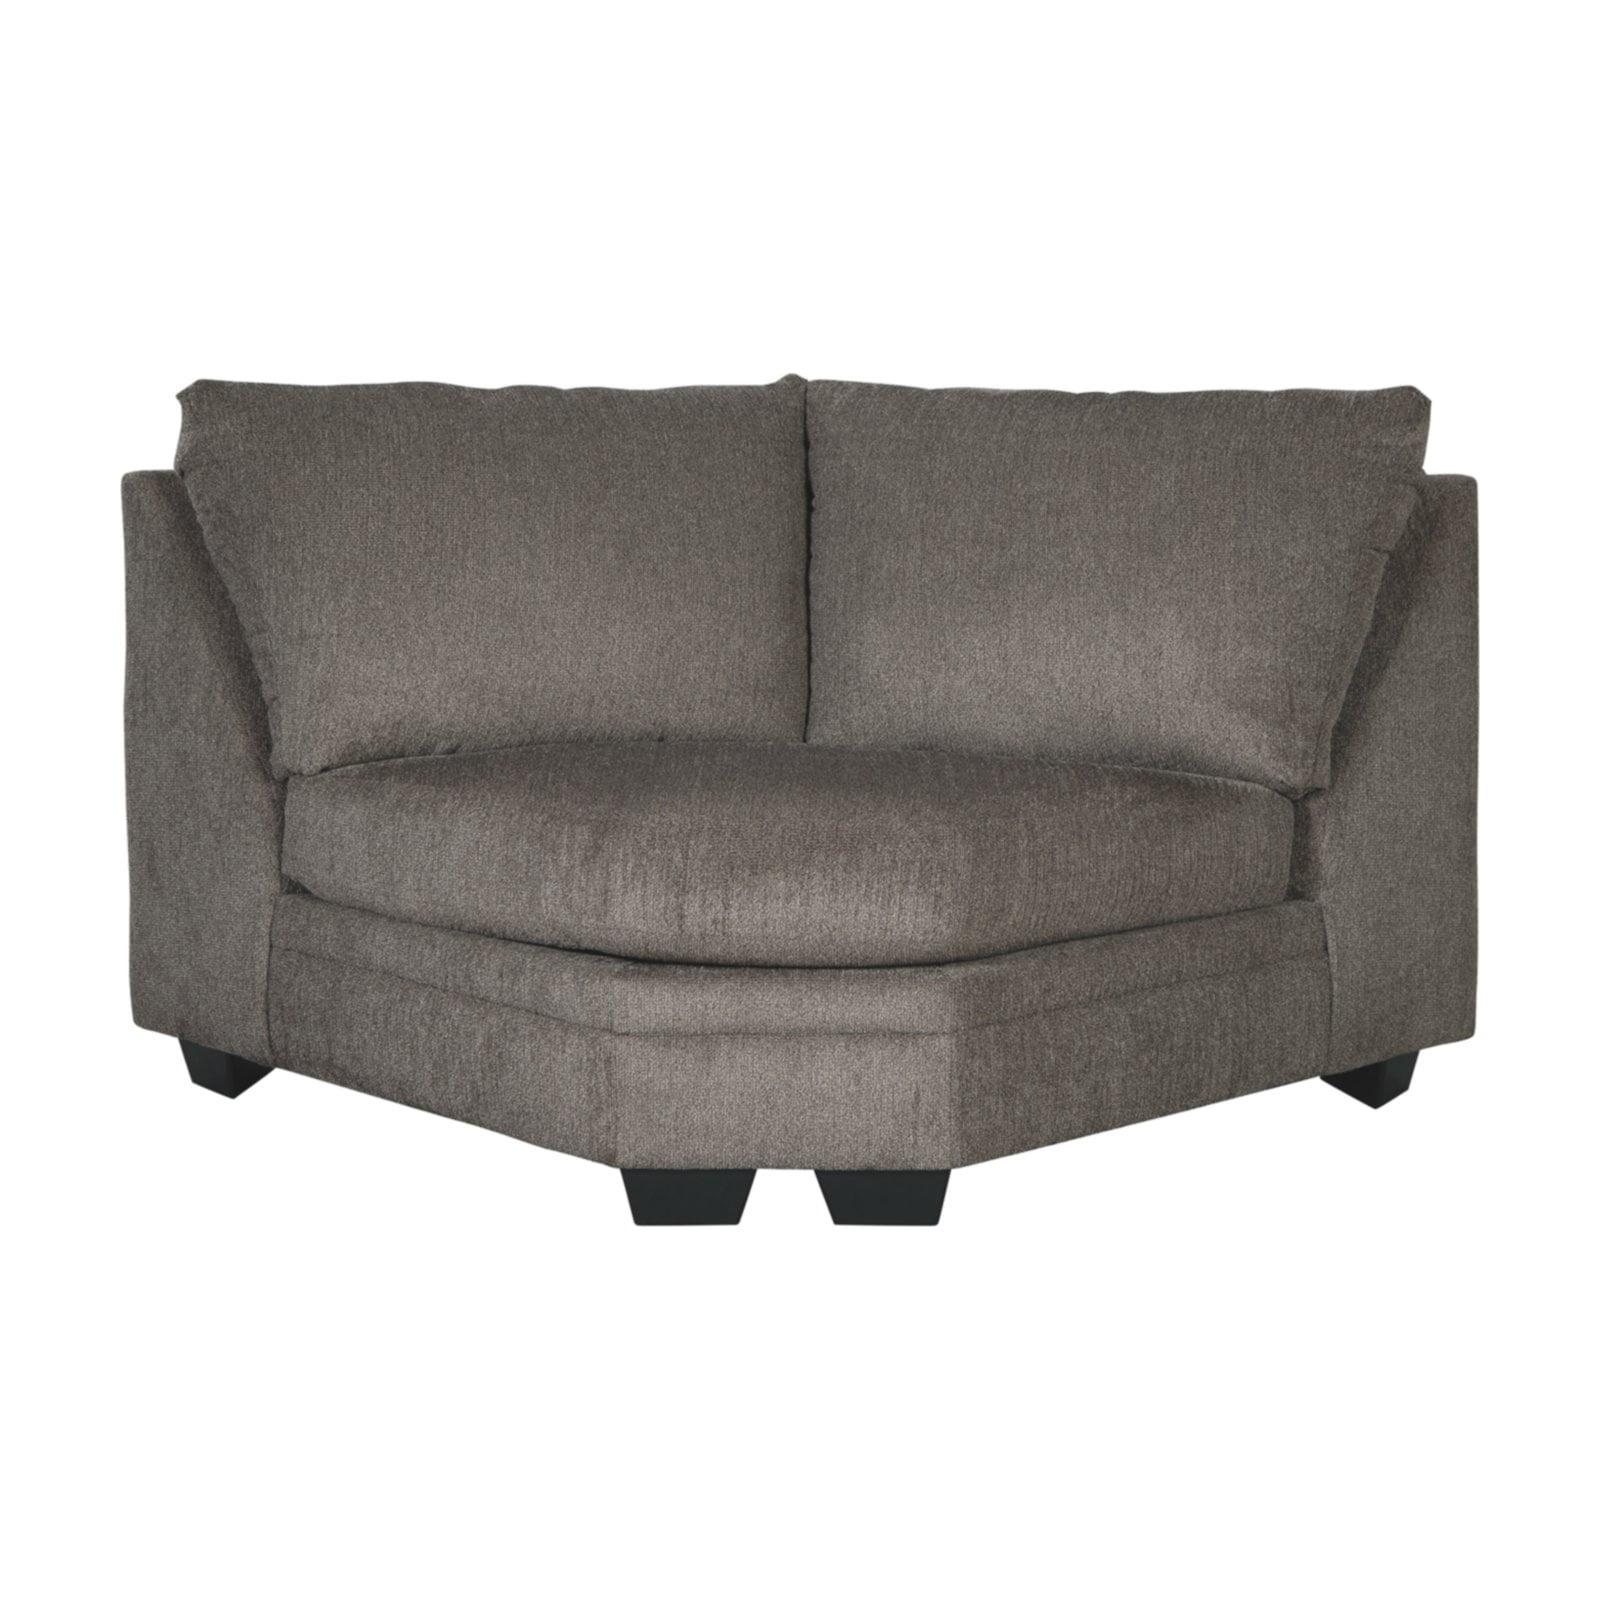 Groovy Signature Design By Ashley Dorsten Wedge Sofa Sectional Piece Unemploymentrelief Wooden Chair Designs For Living Room Unemploymentrelieforg